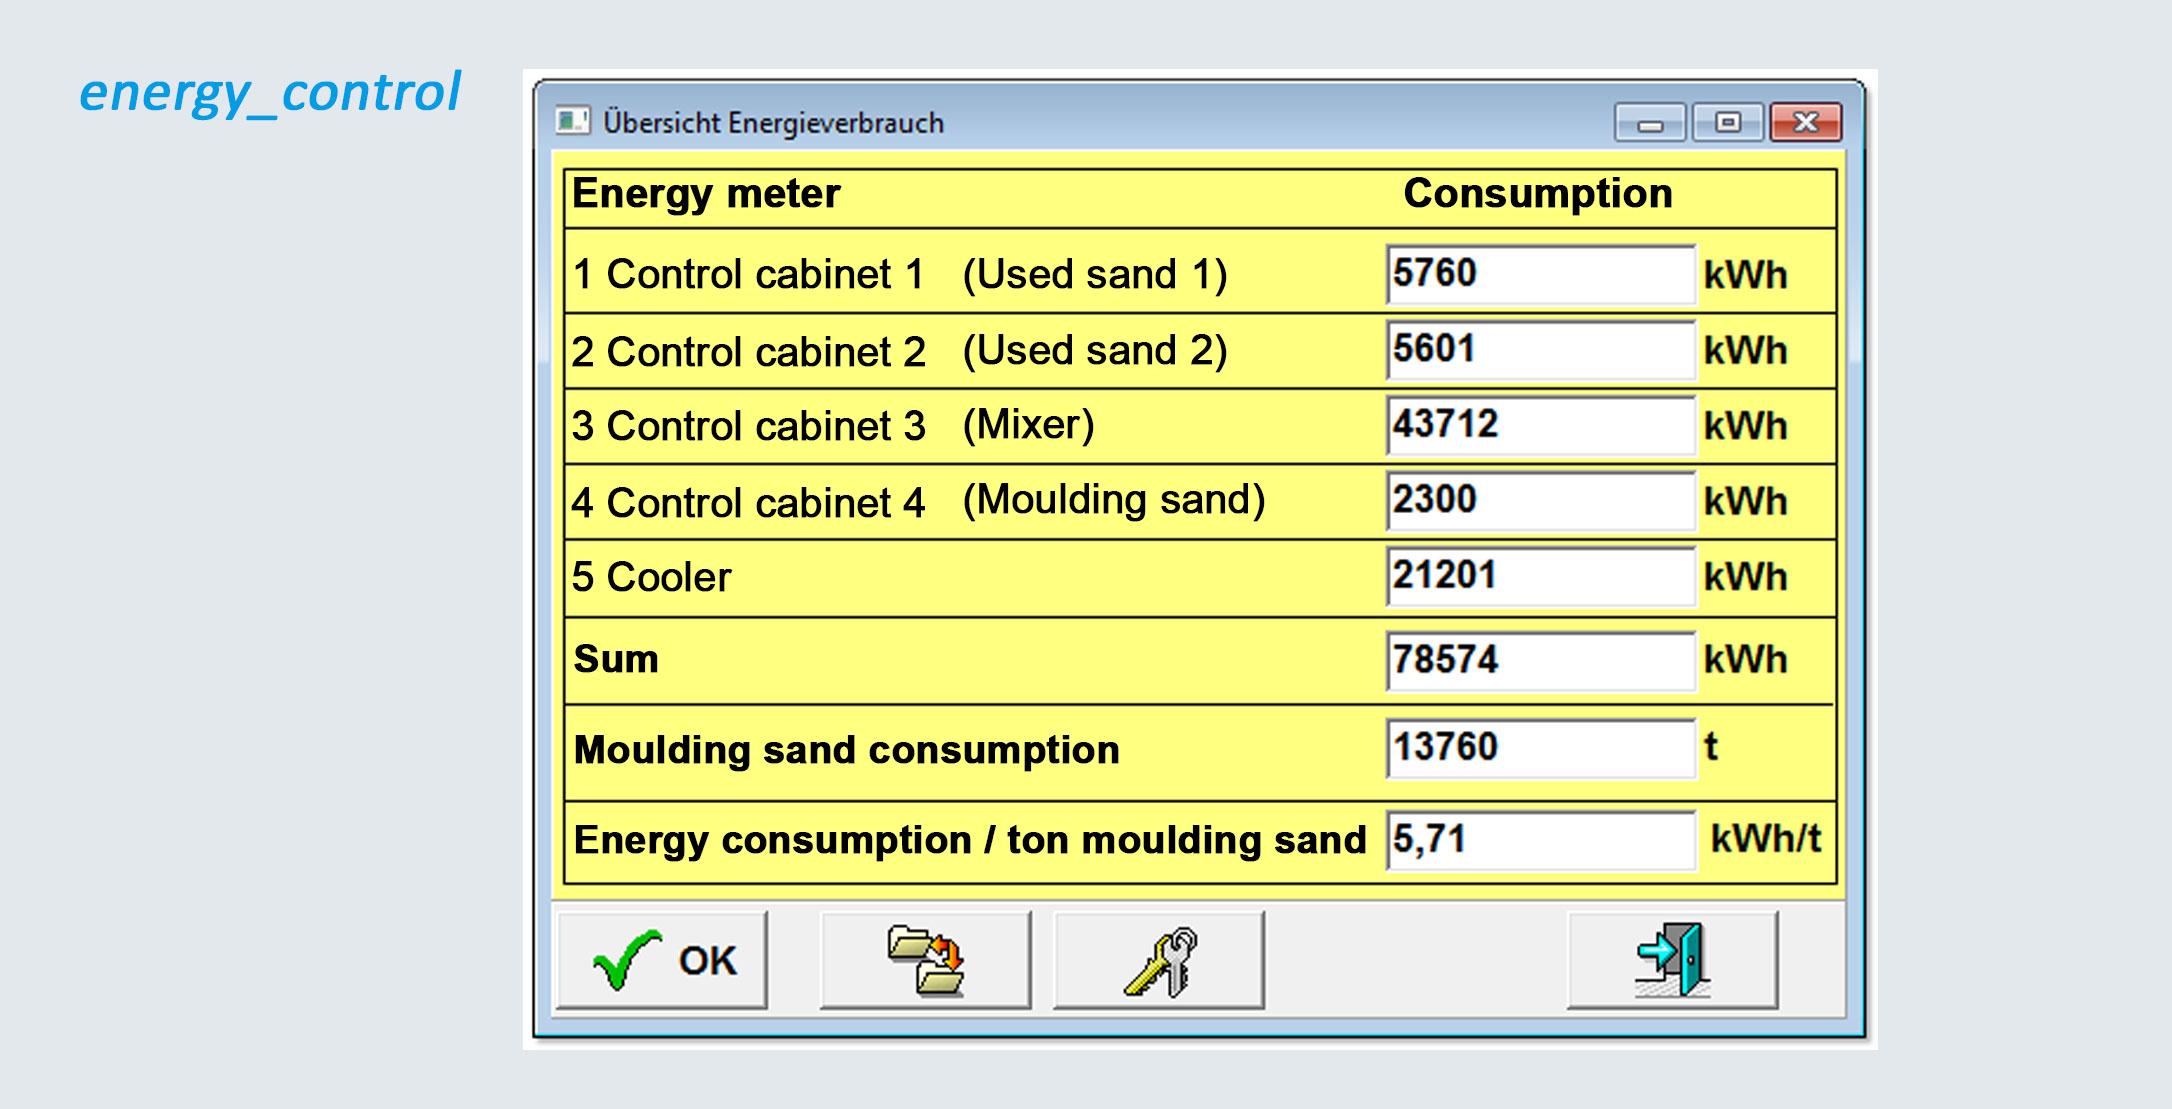 Energiemanagement-Tool energy_control